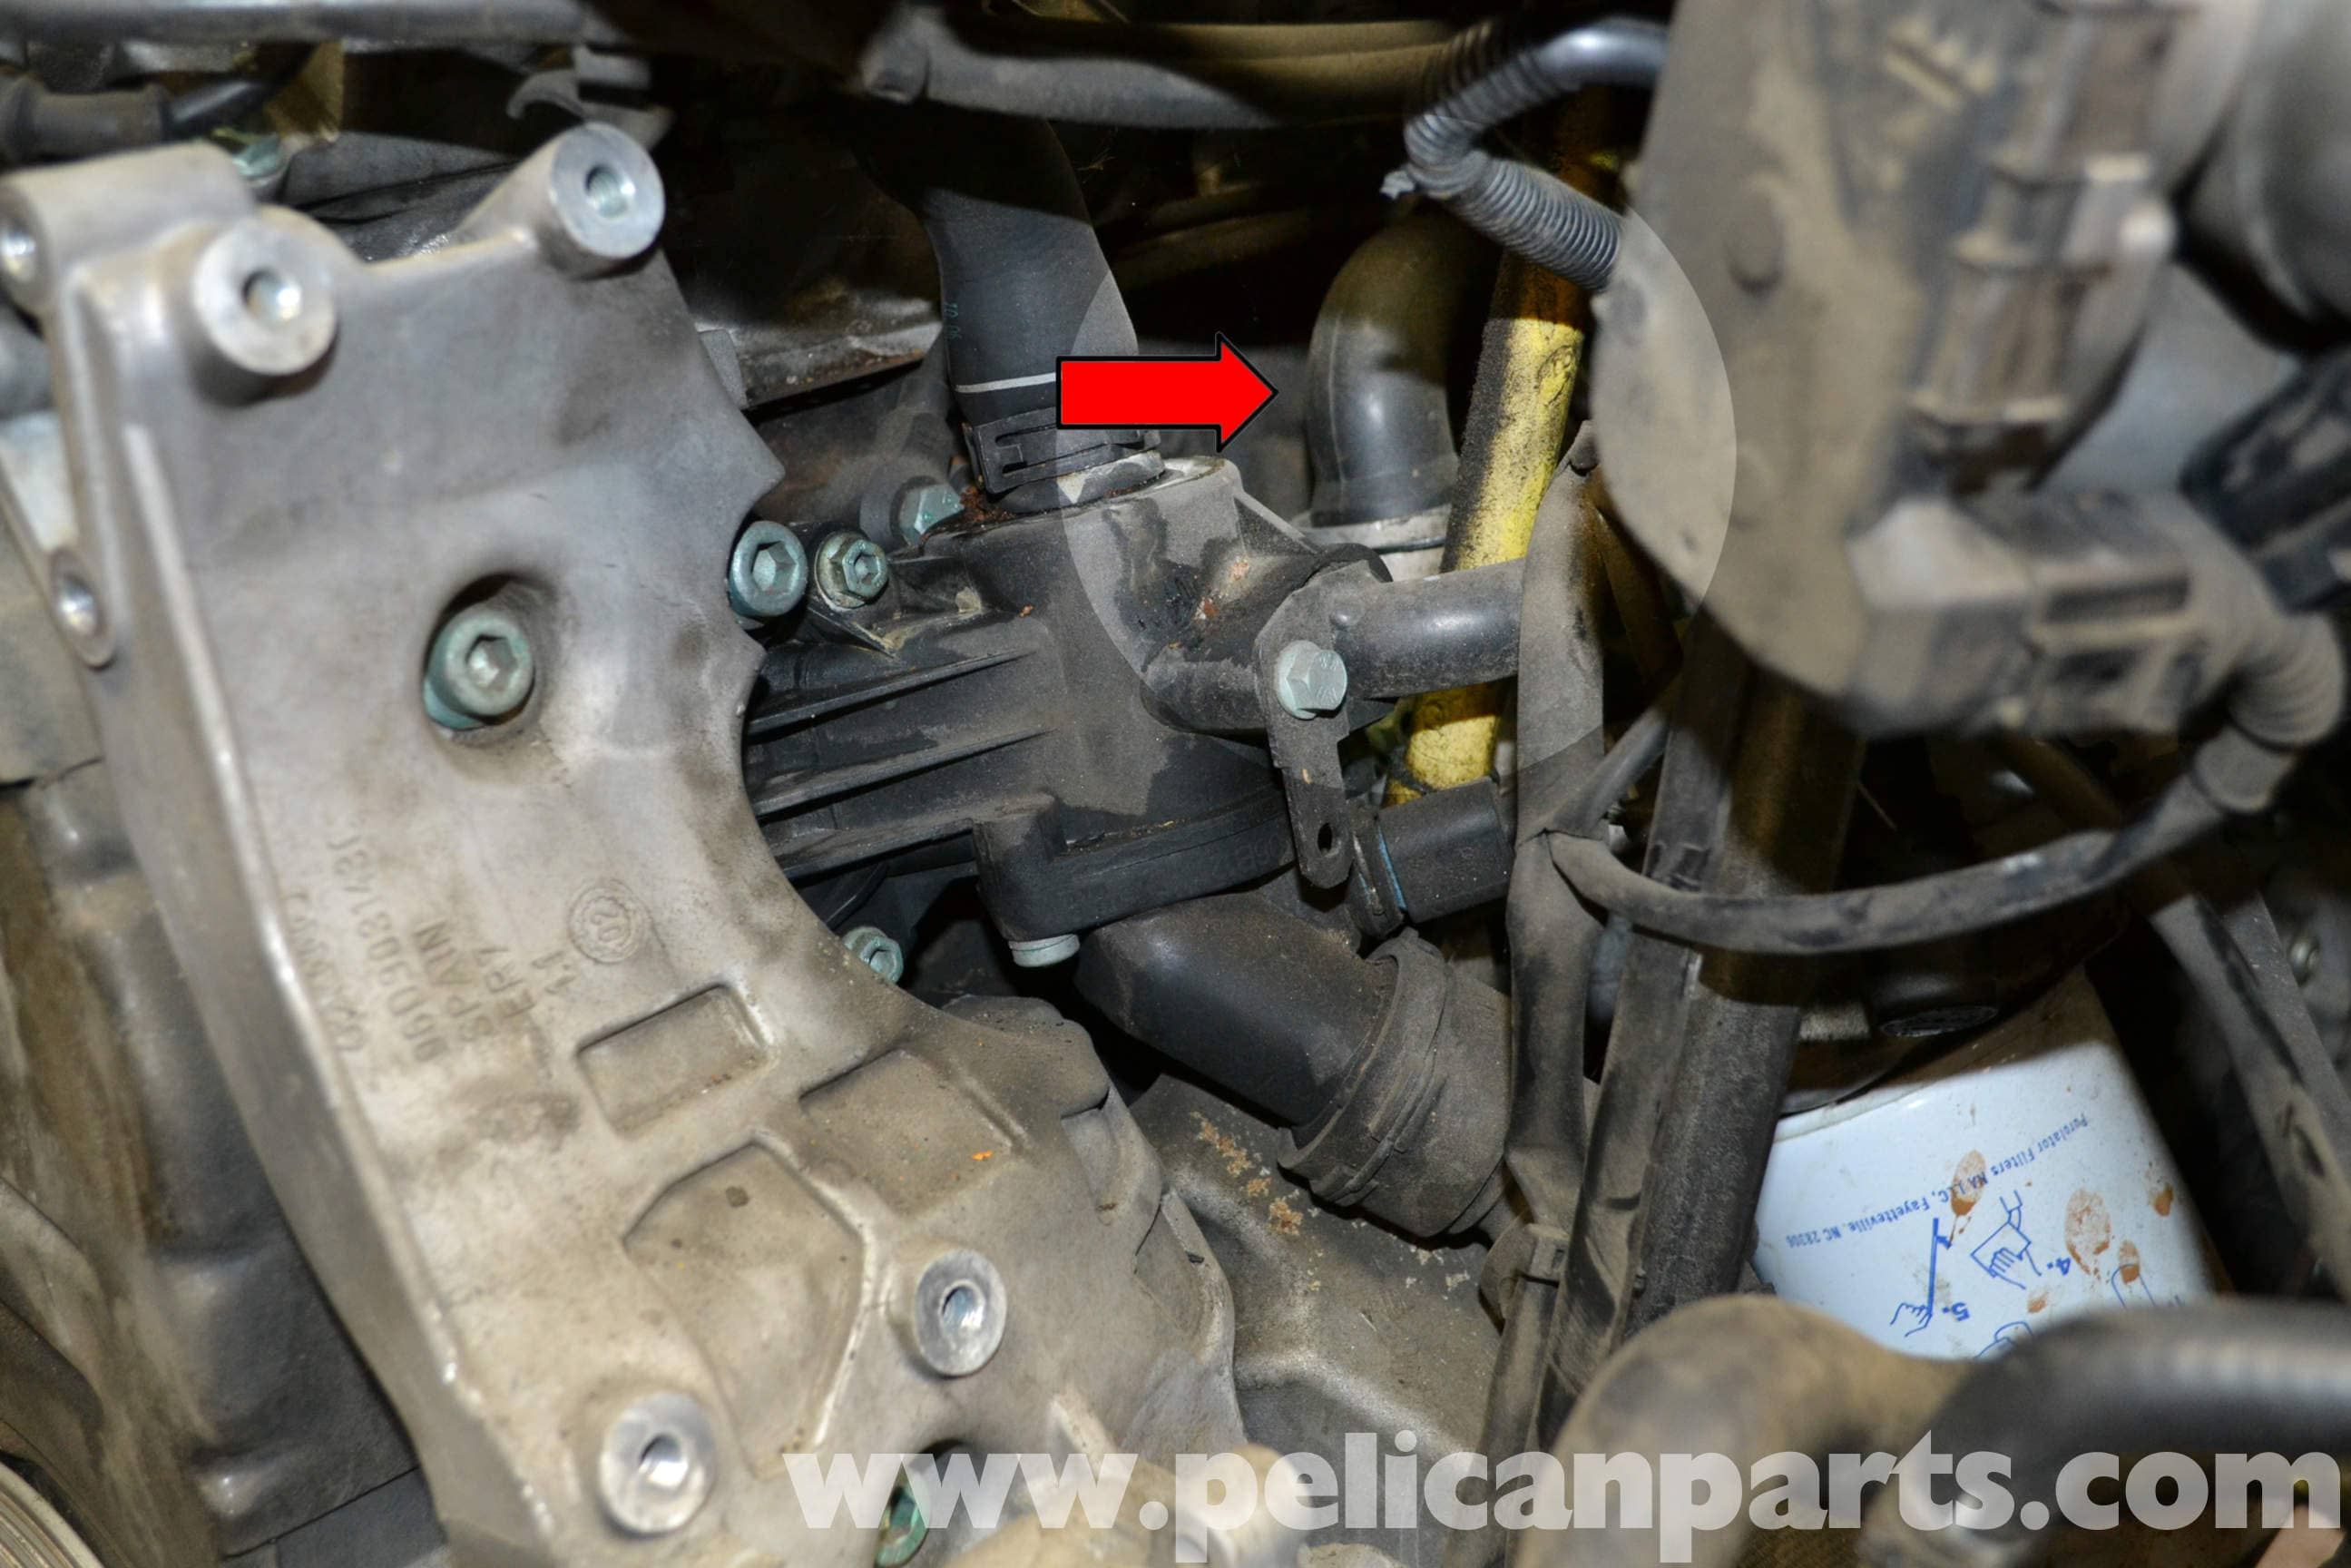 Audi A4 B6 Fixing Common Vacuum Leaks 2002 2008 Pelican Parts Maf Sensor Wiring Diagram 98 1 8 Large Image